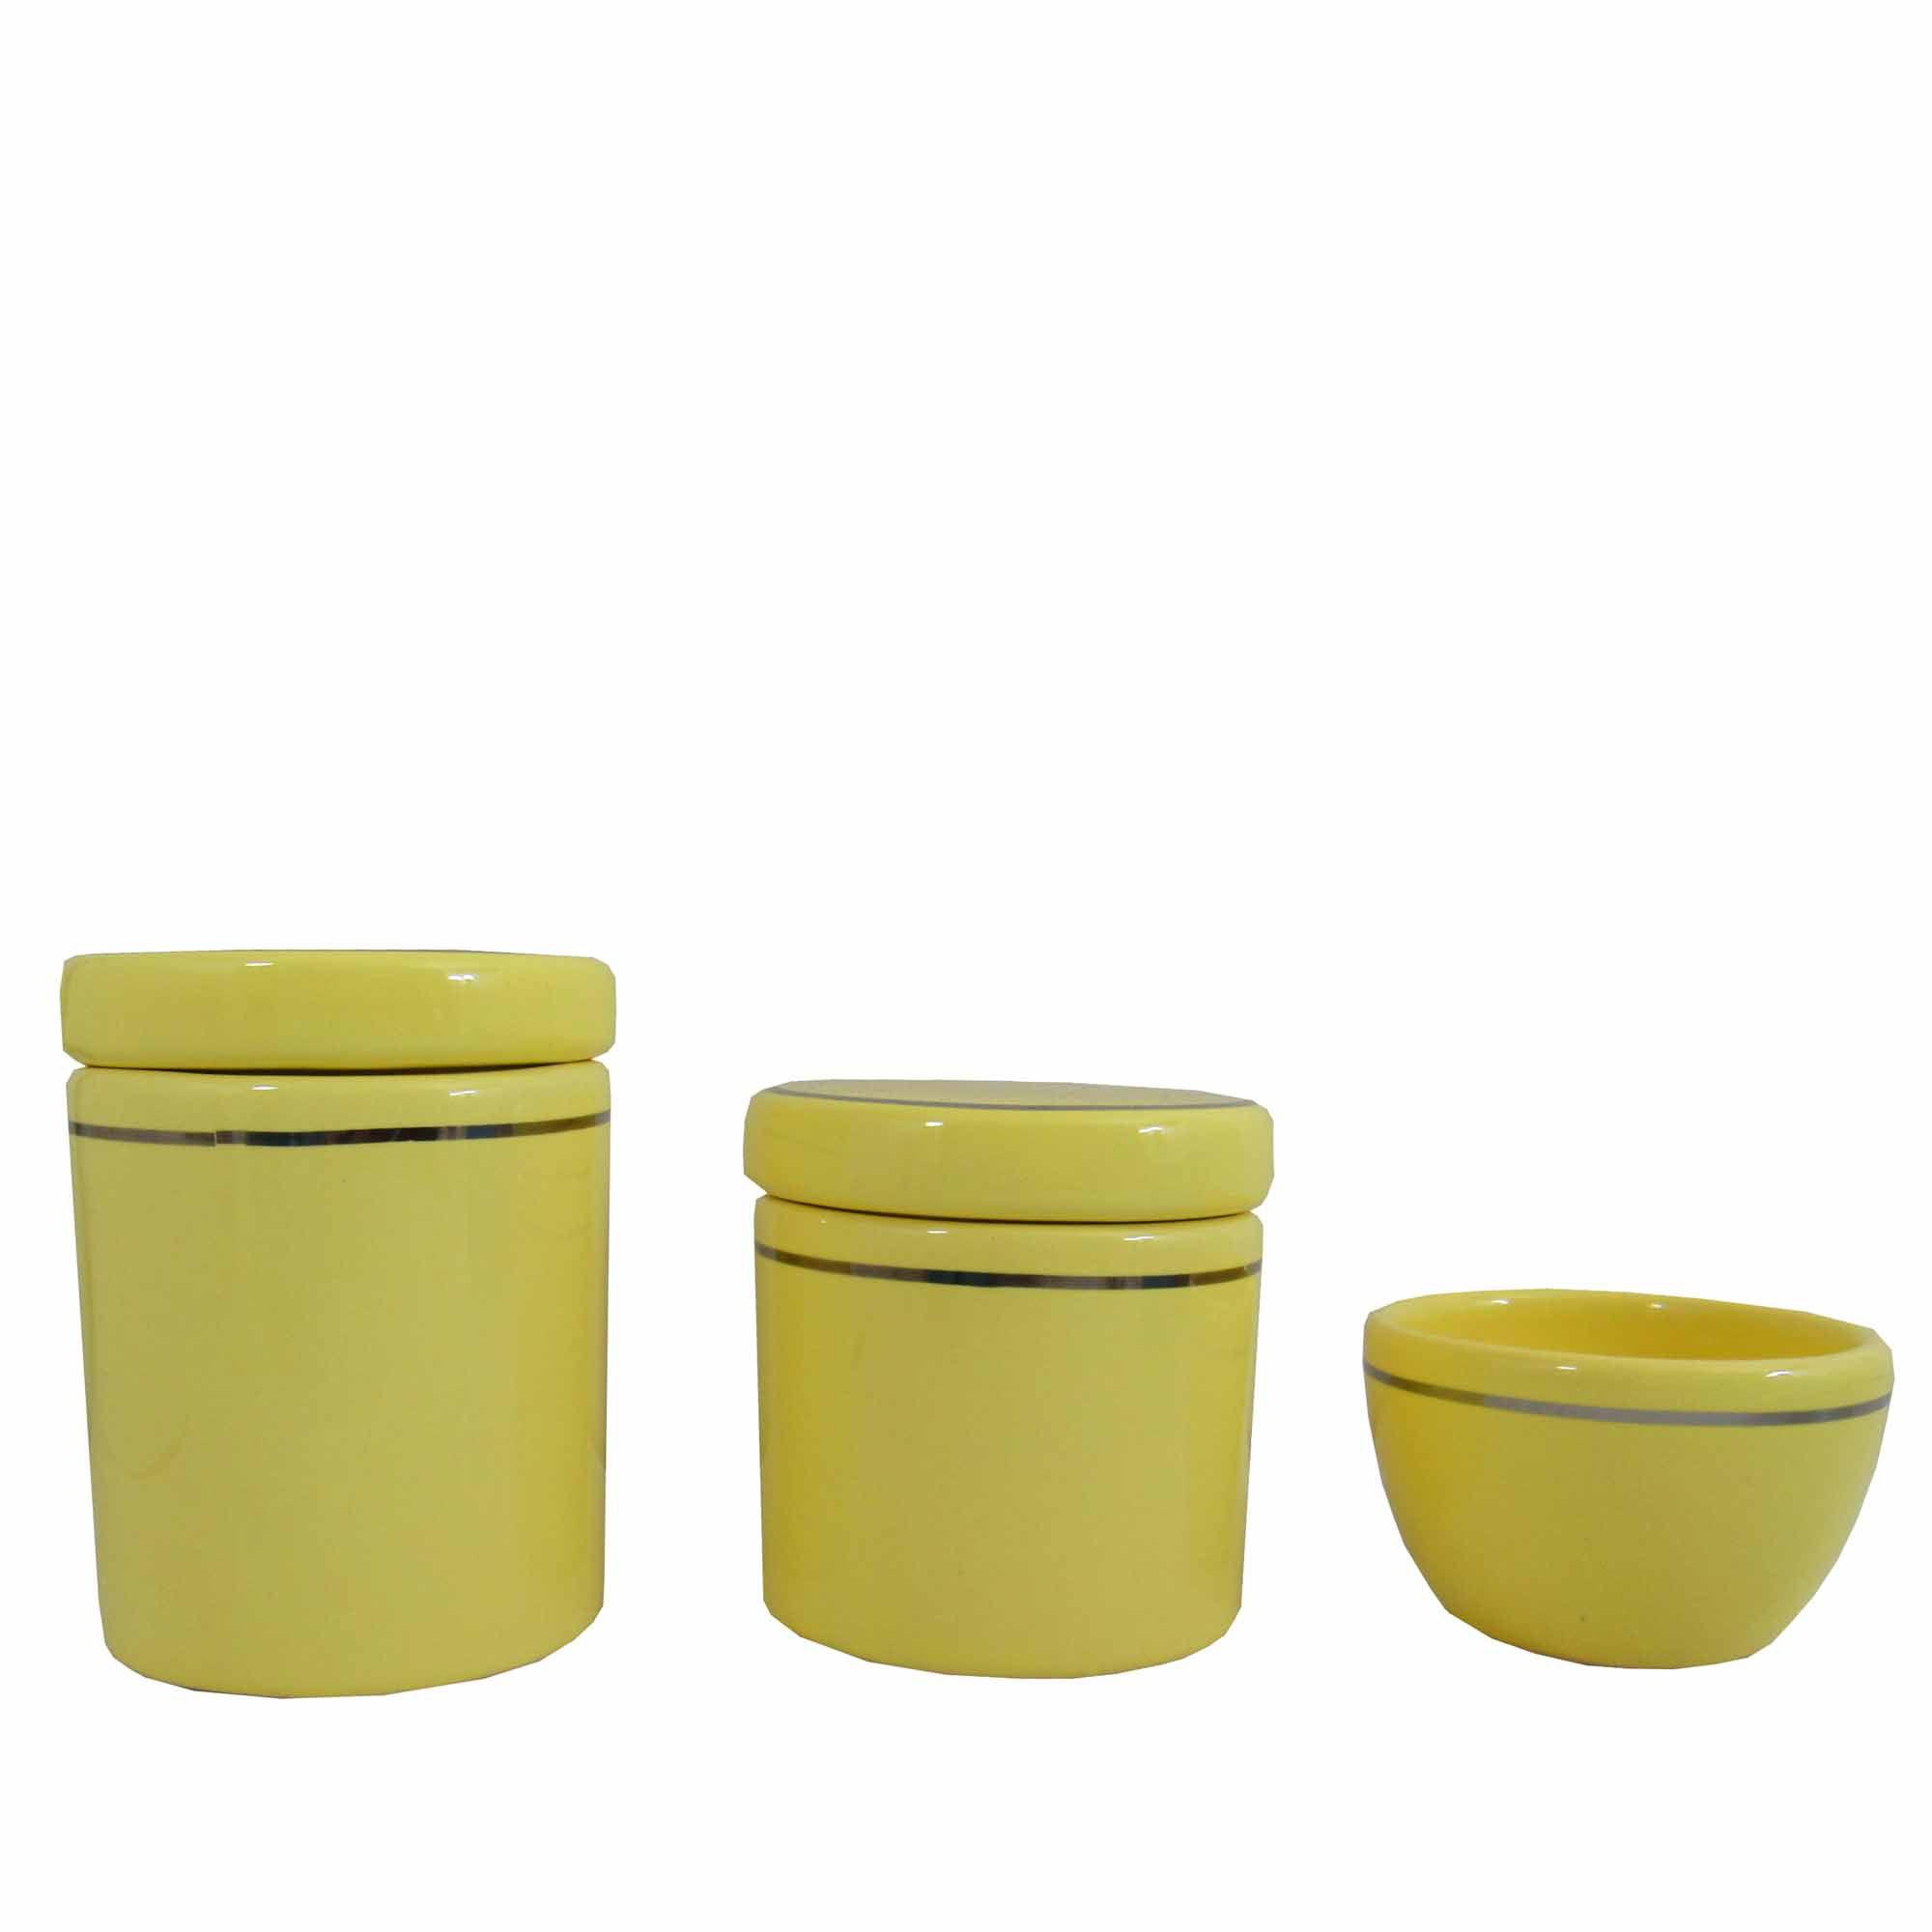 Kit Higiene de Porcelana Menina - 3 Peças